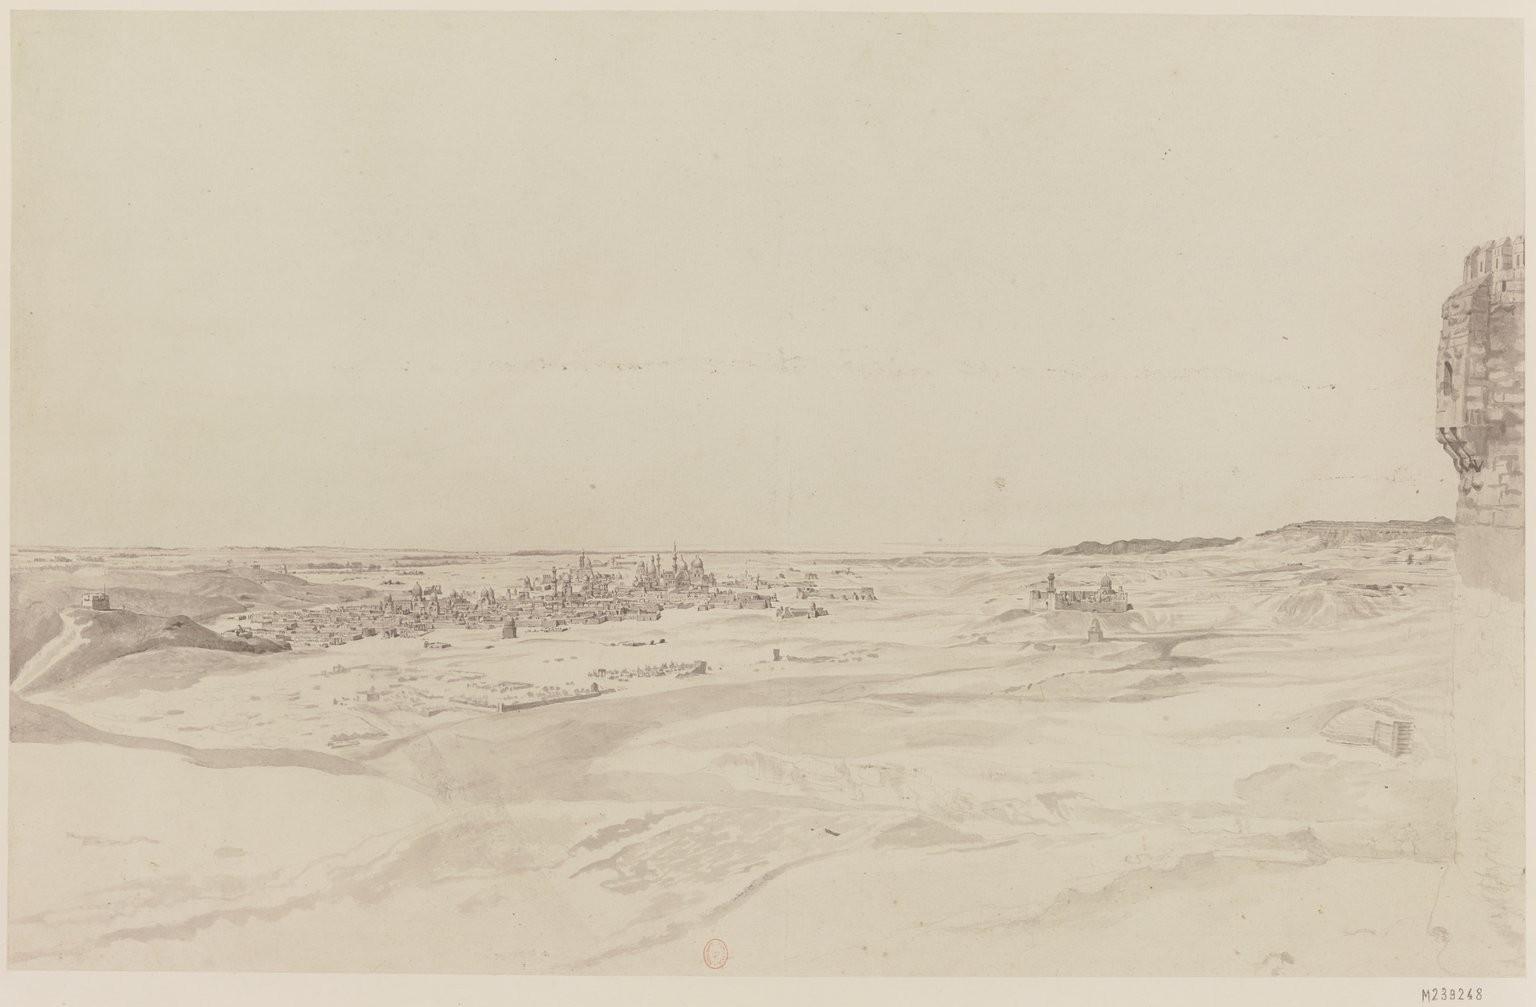 Каир. Вид на город гробниц из Цитадели